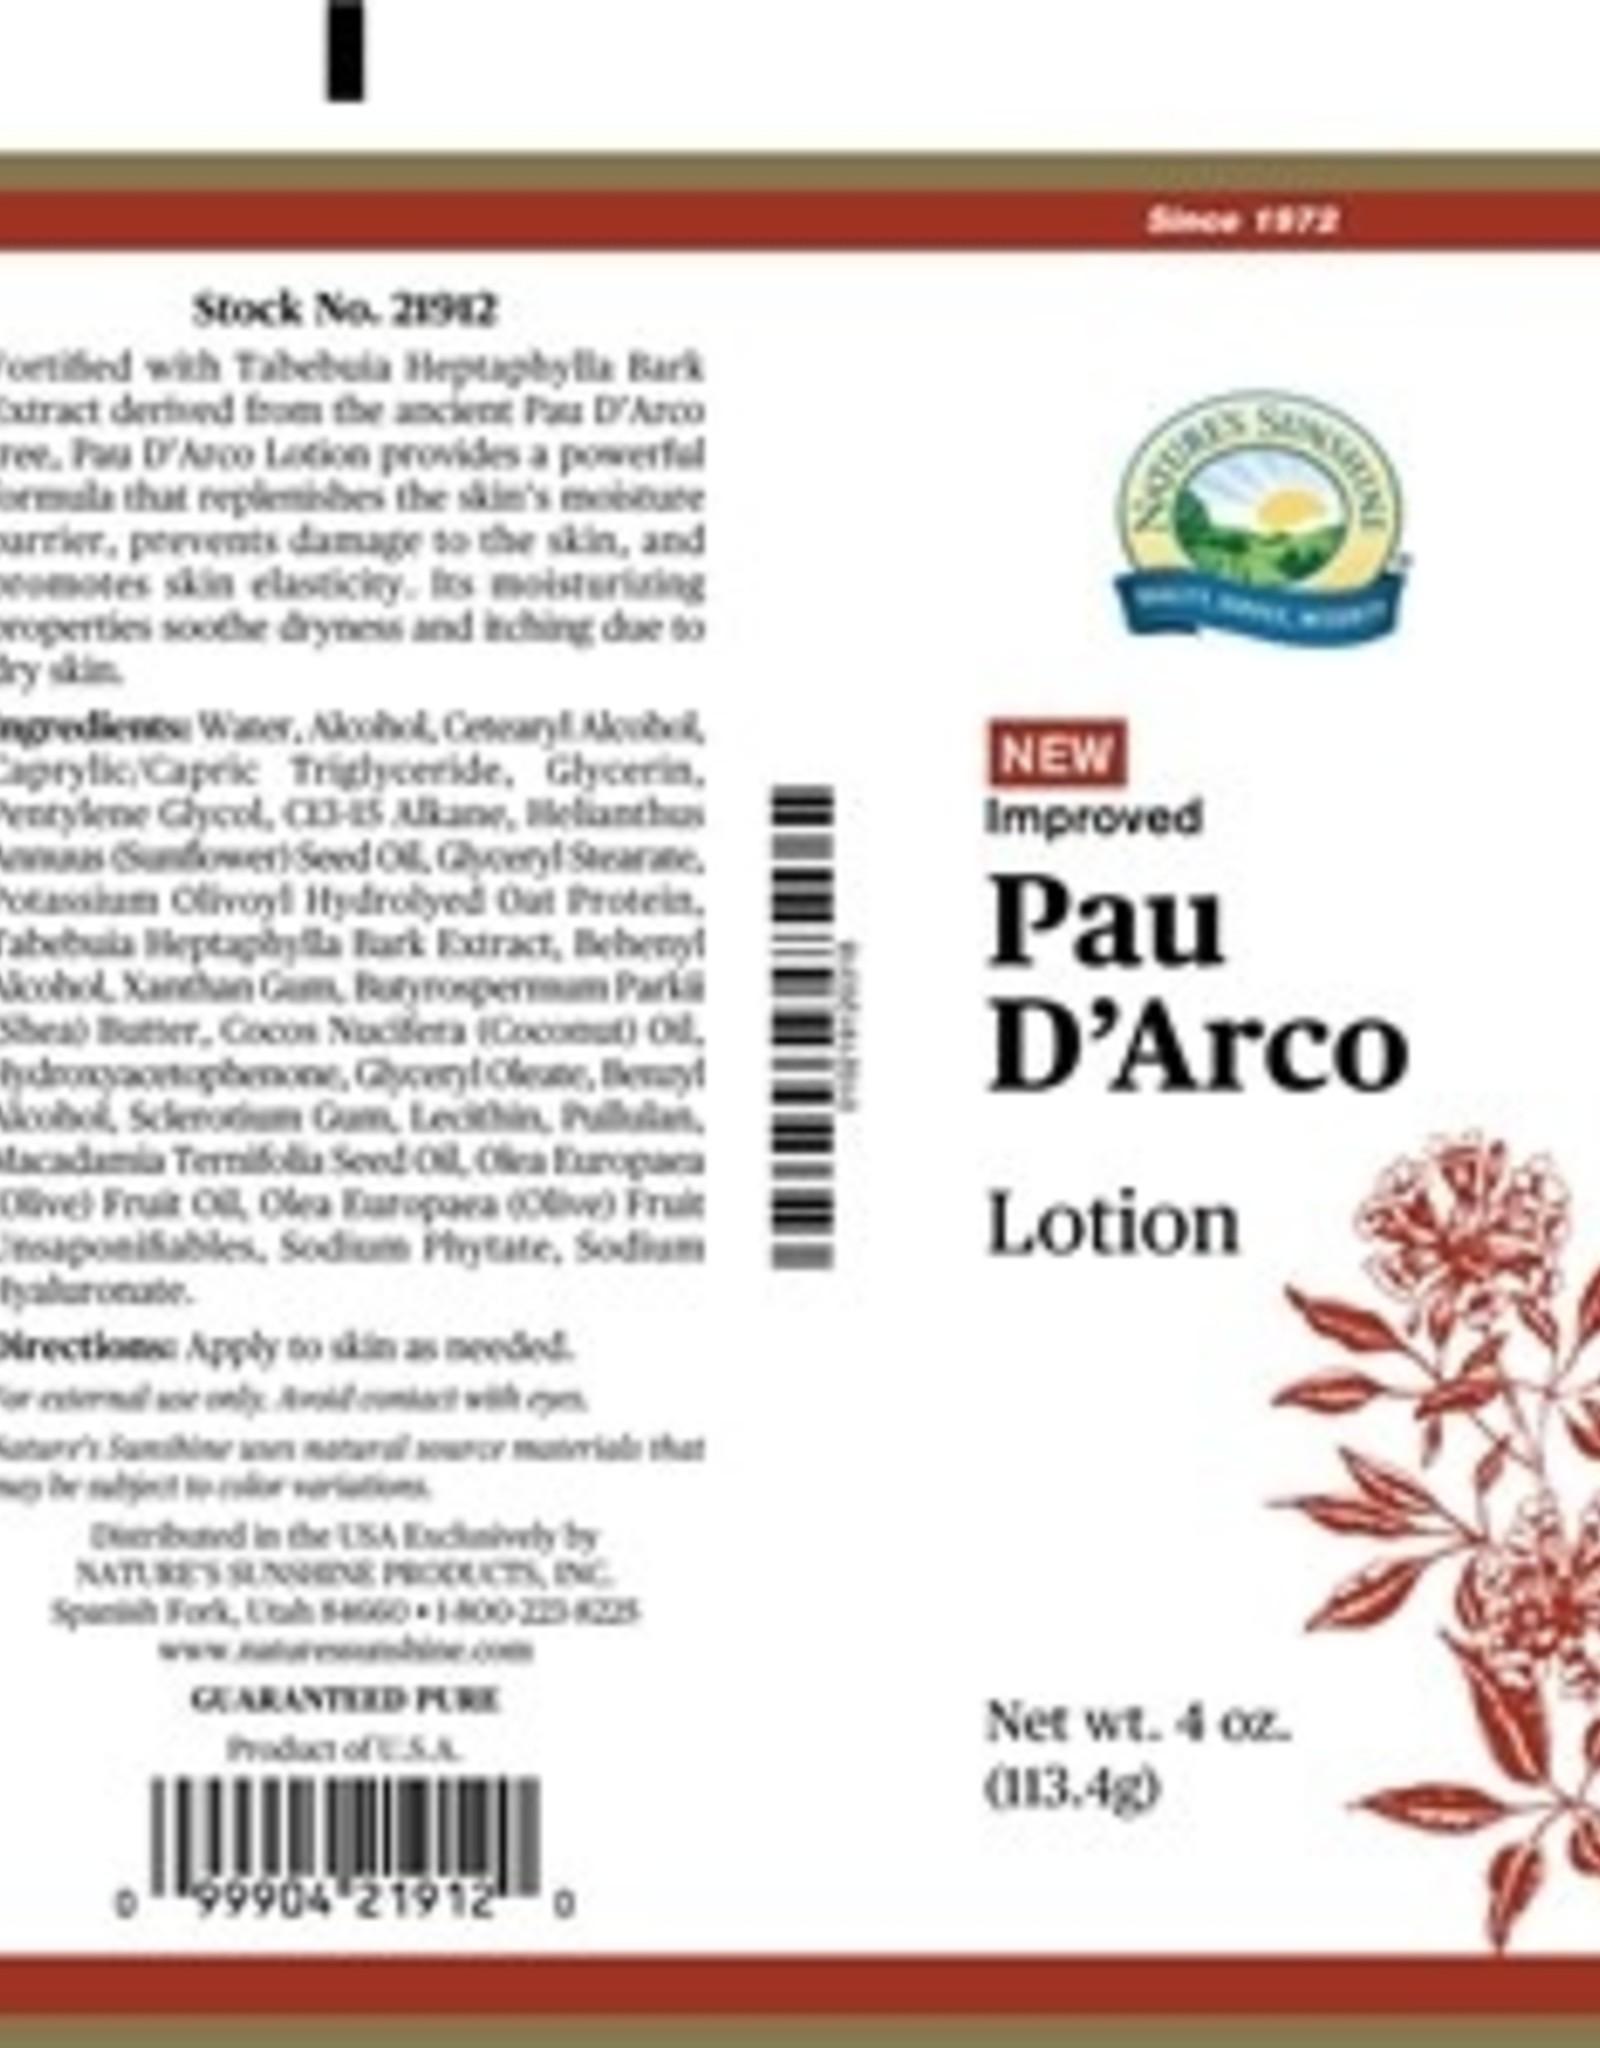 Nature's Sunshine Pau D'Arco Lotion (4 oz. tube)